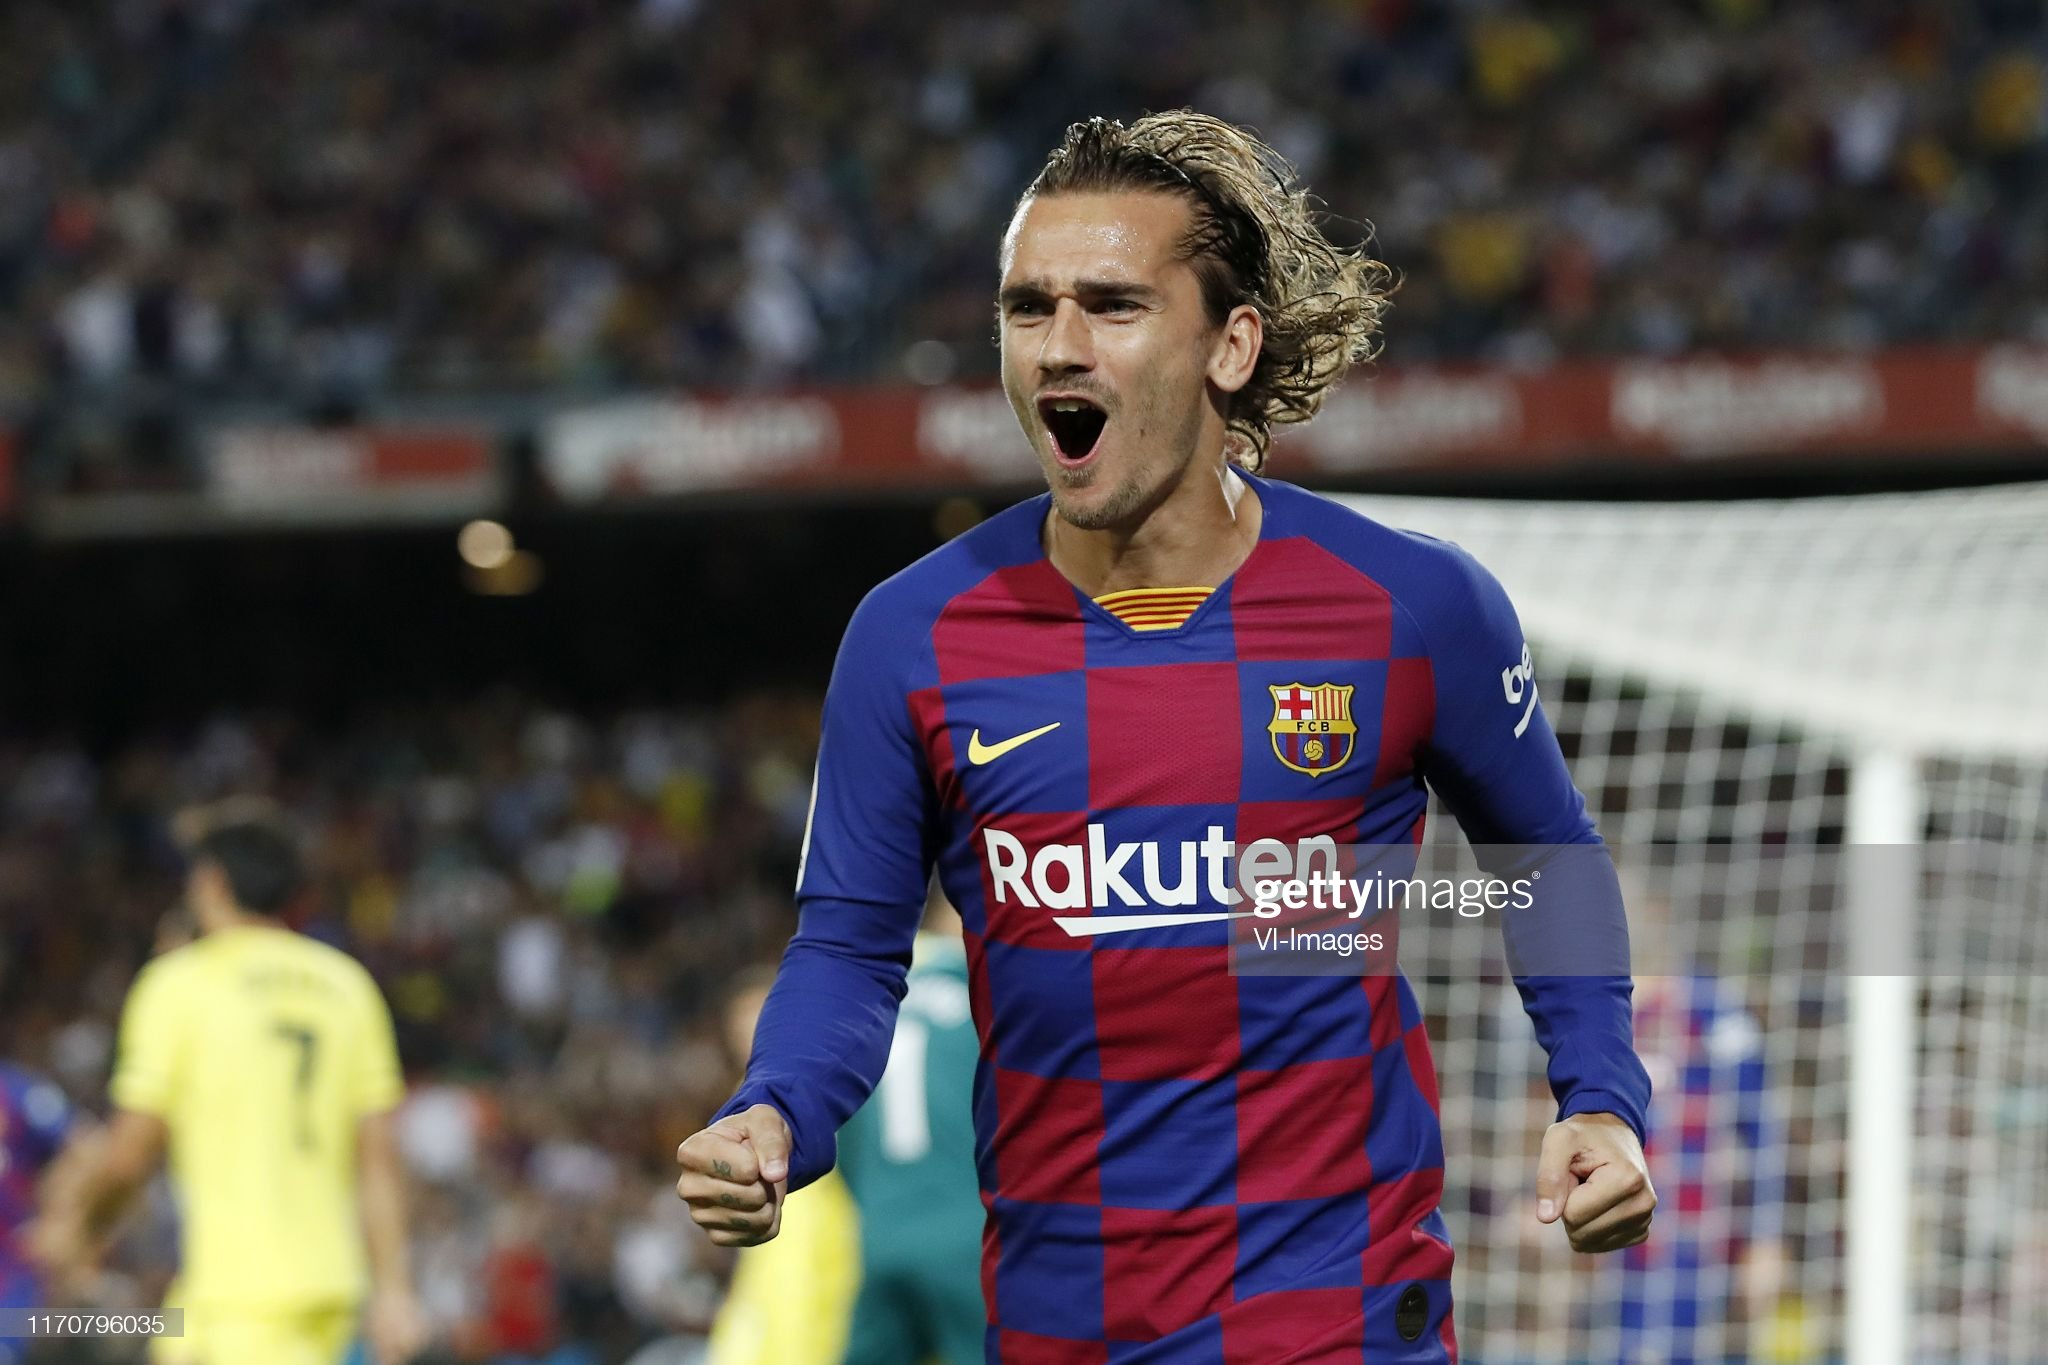 صور مباراة : برشلونة - فياريال 2-1 ( 24-09-2019 )  Antoine-griezmann-of-fc-barcelona-during-the-laliga-santander-match-picture-id1170796035?s=2048x2048